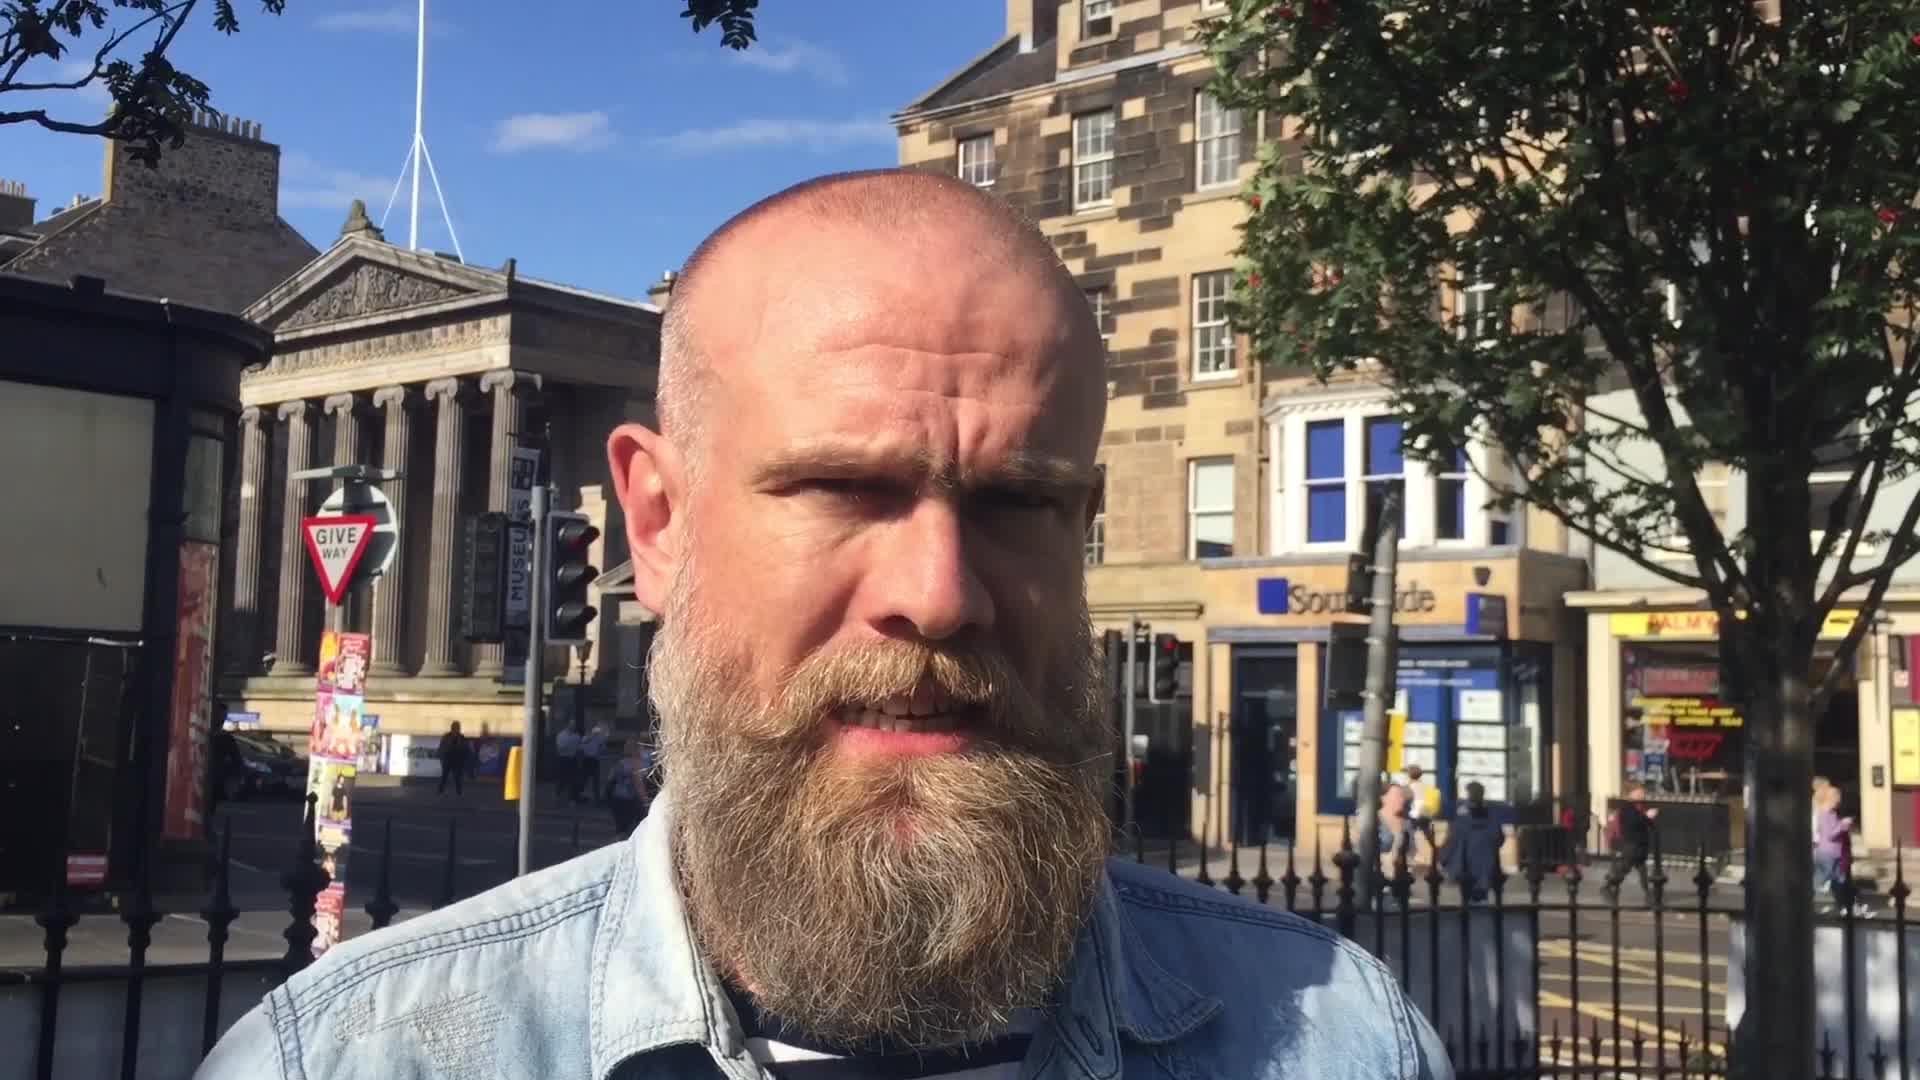 Edinburgh Fringe Festival: How Does Dave's 'Funniest Joke' Winner Compare To Past Years?